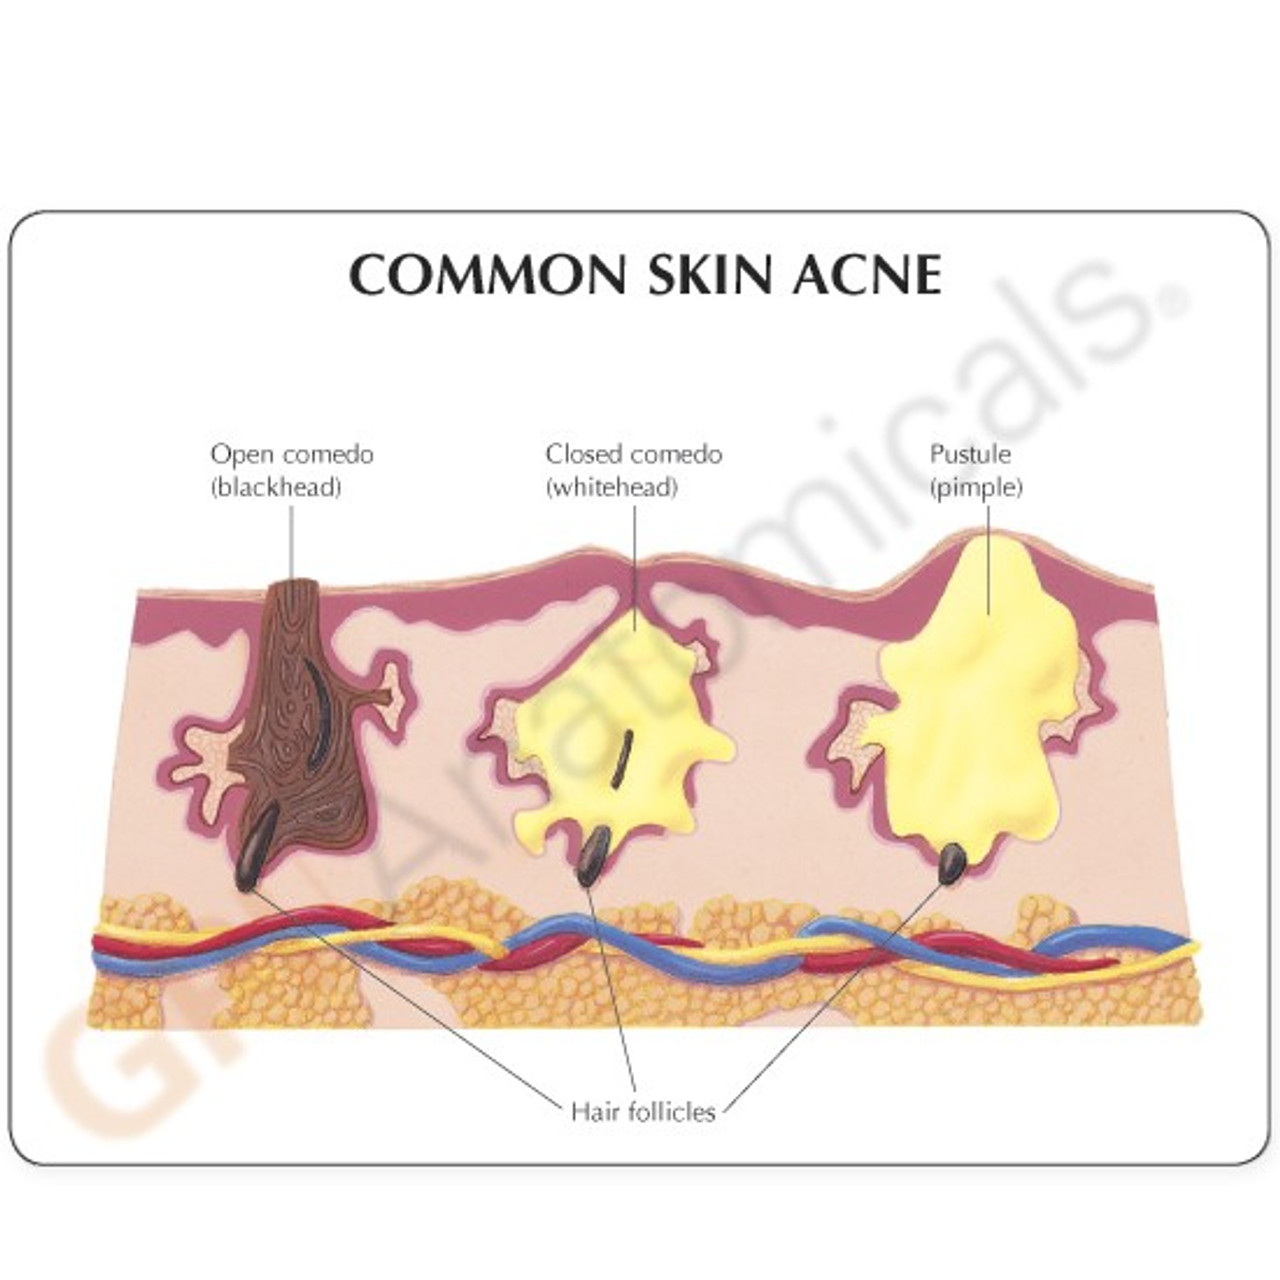 Skin Acne Model Description Card